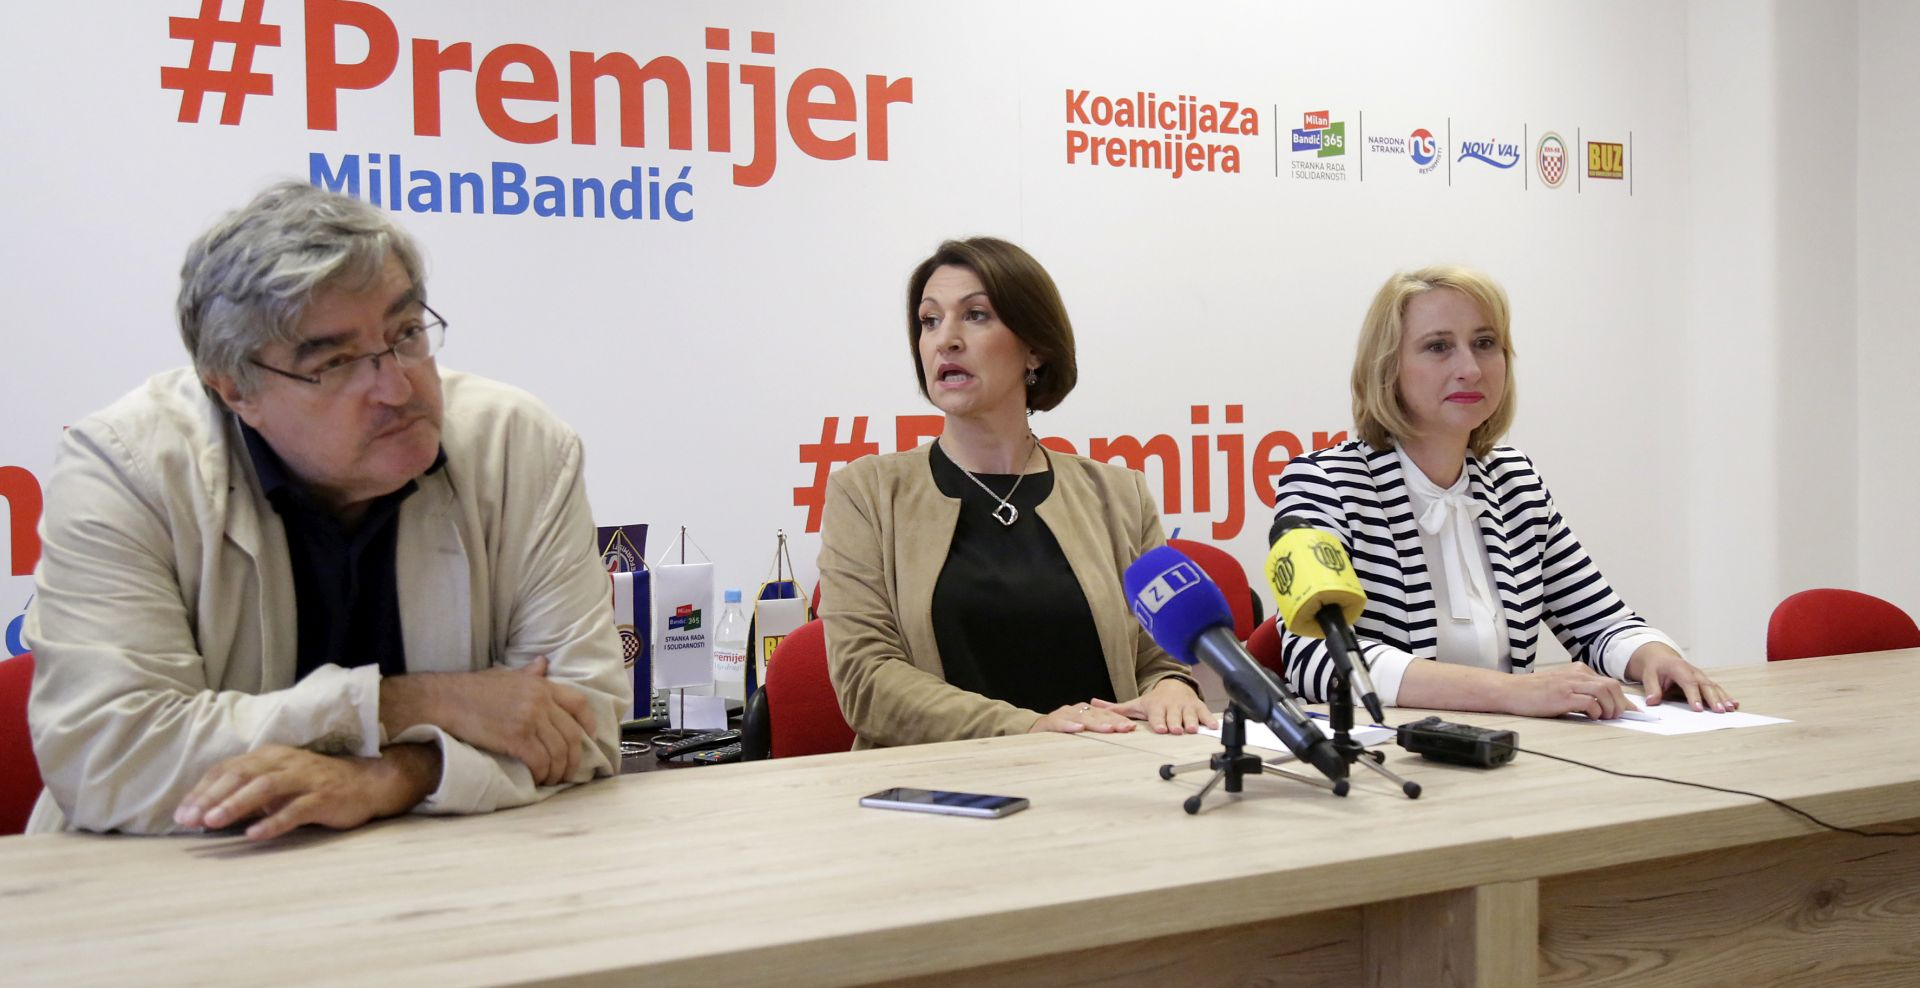 SLOBODAN PROSPEROV NOVAK 'Uzurpacija predizborne kampanje'